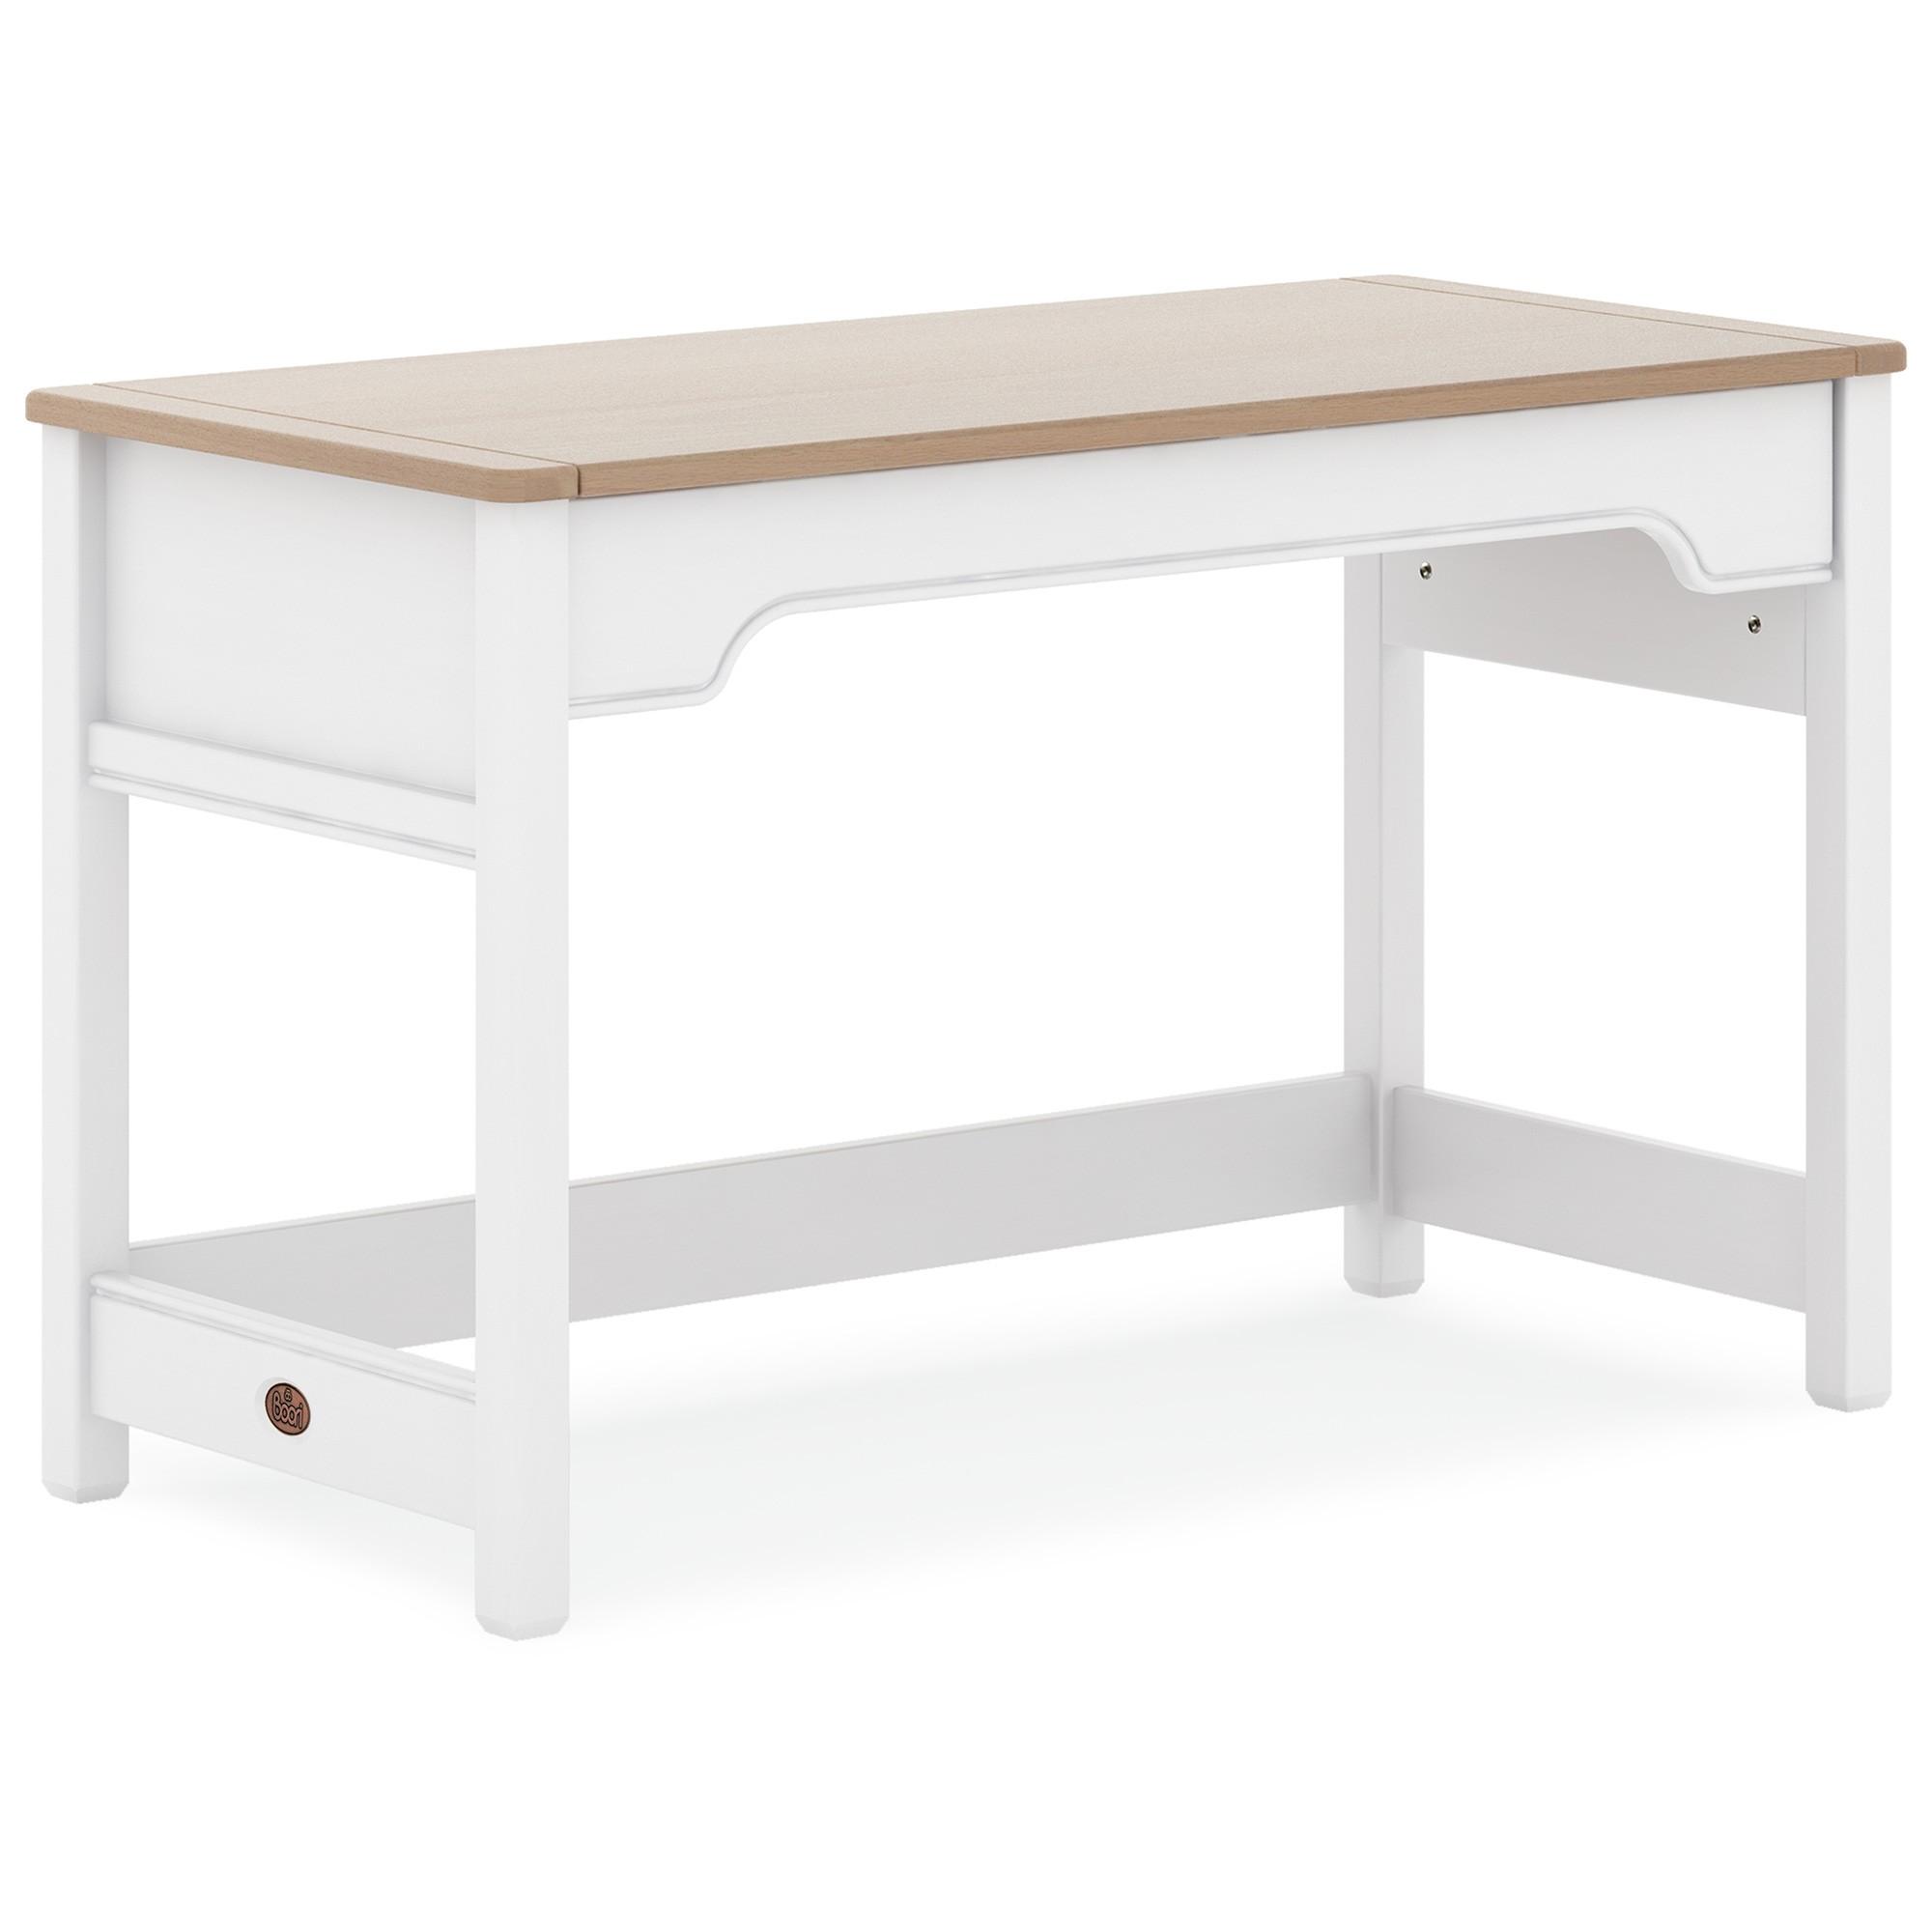 Boori Universal Wooden Desk, 122cm, Truffle / Barley White